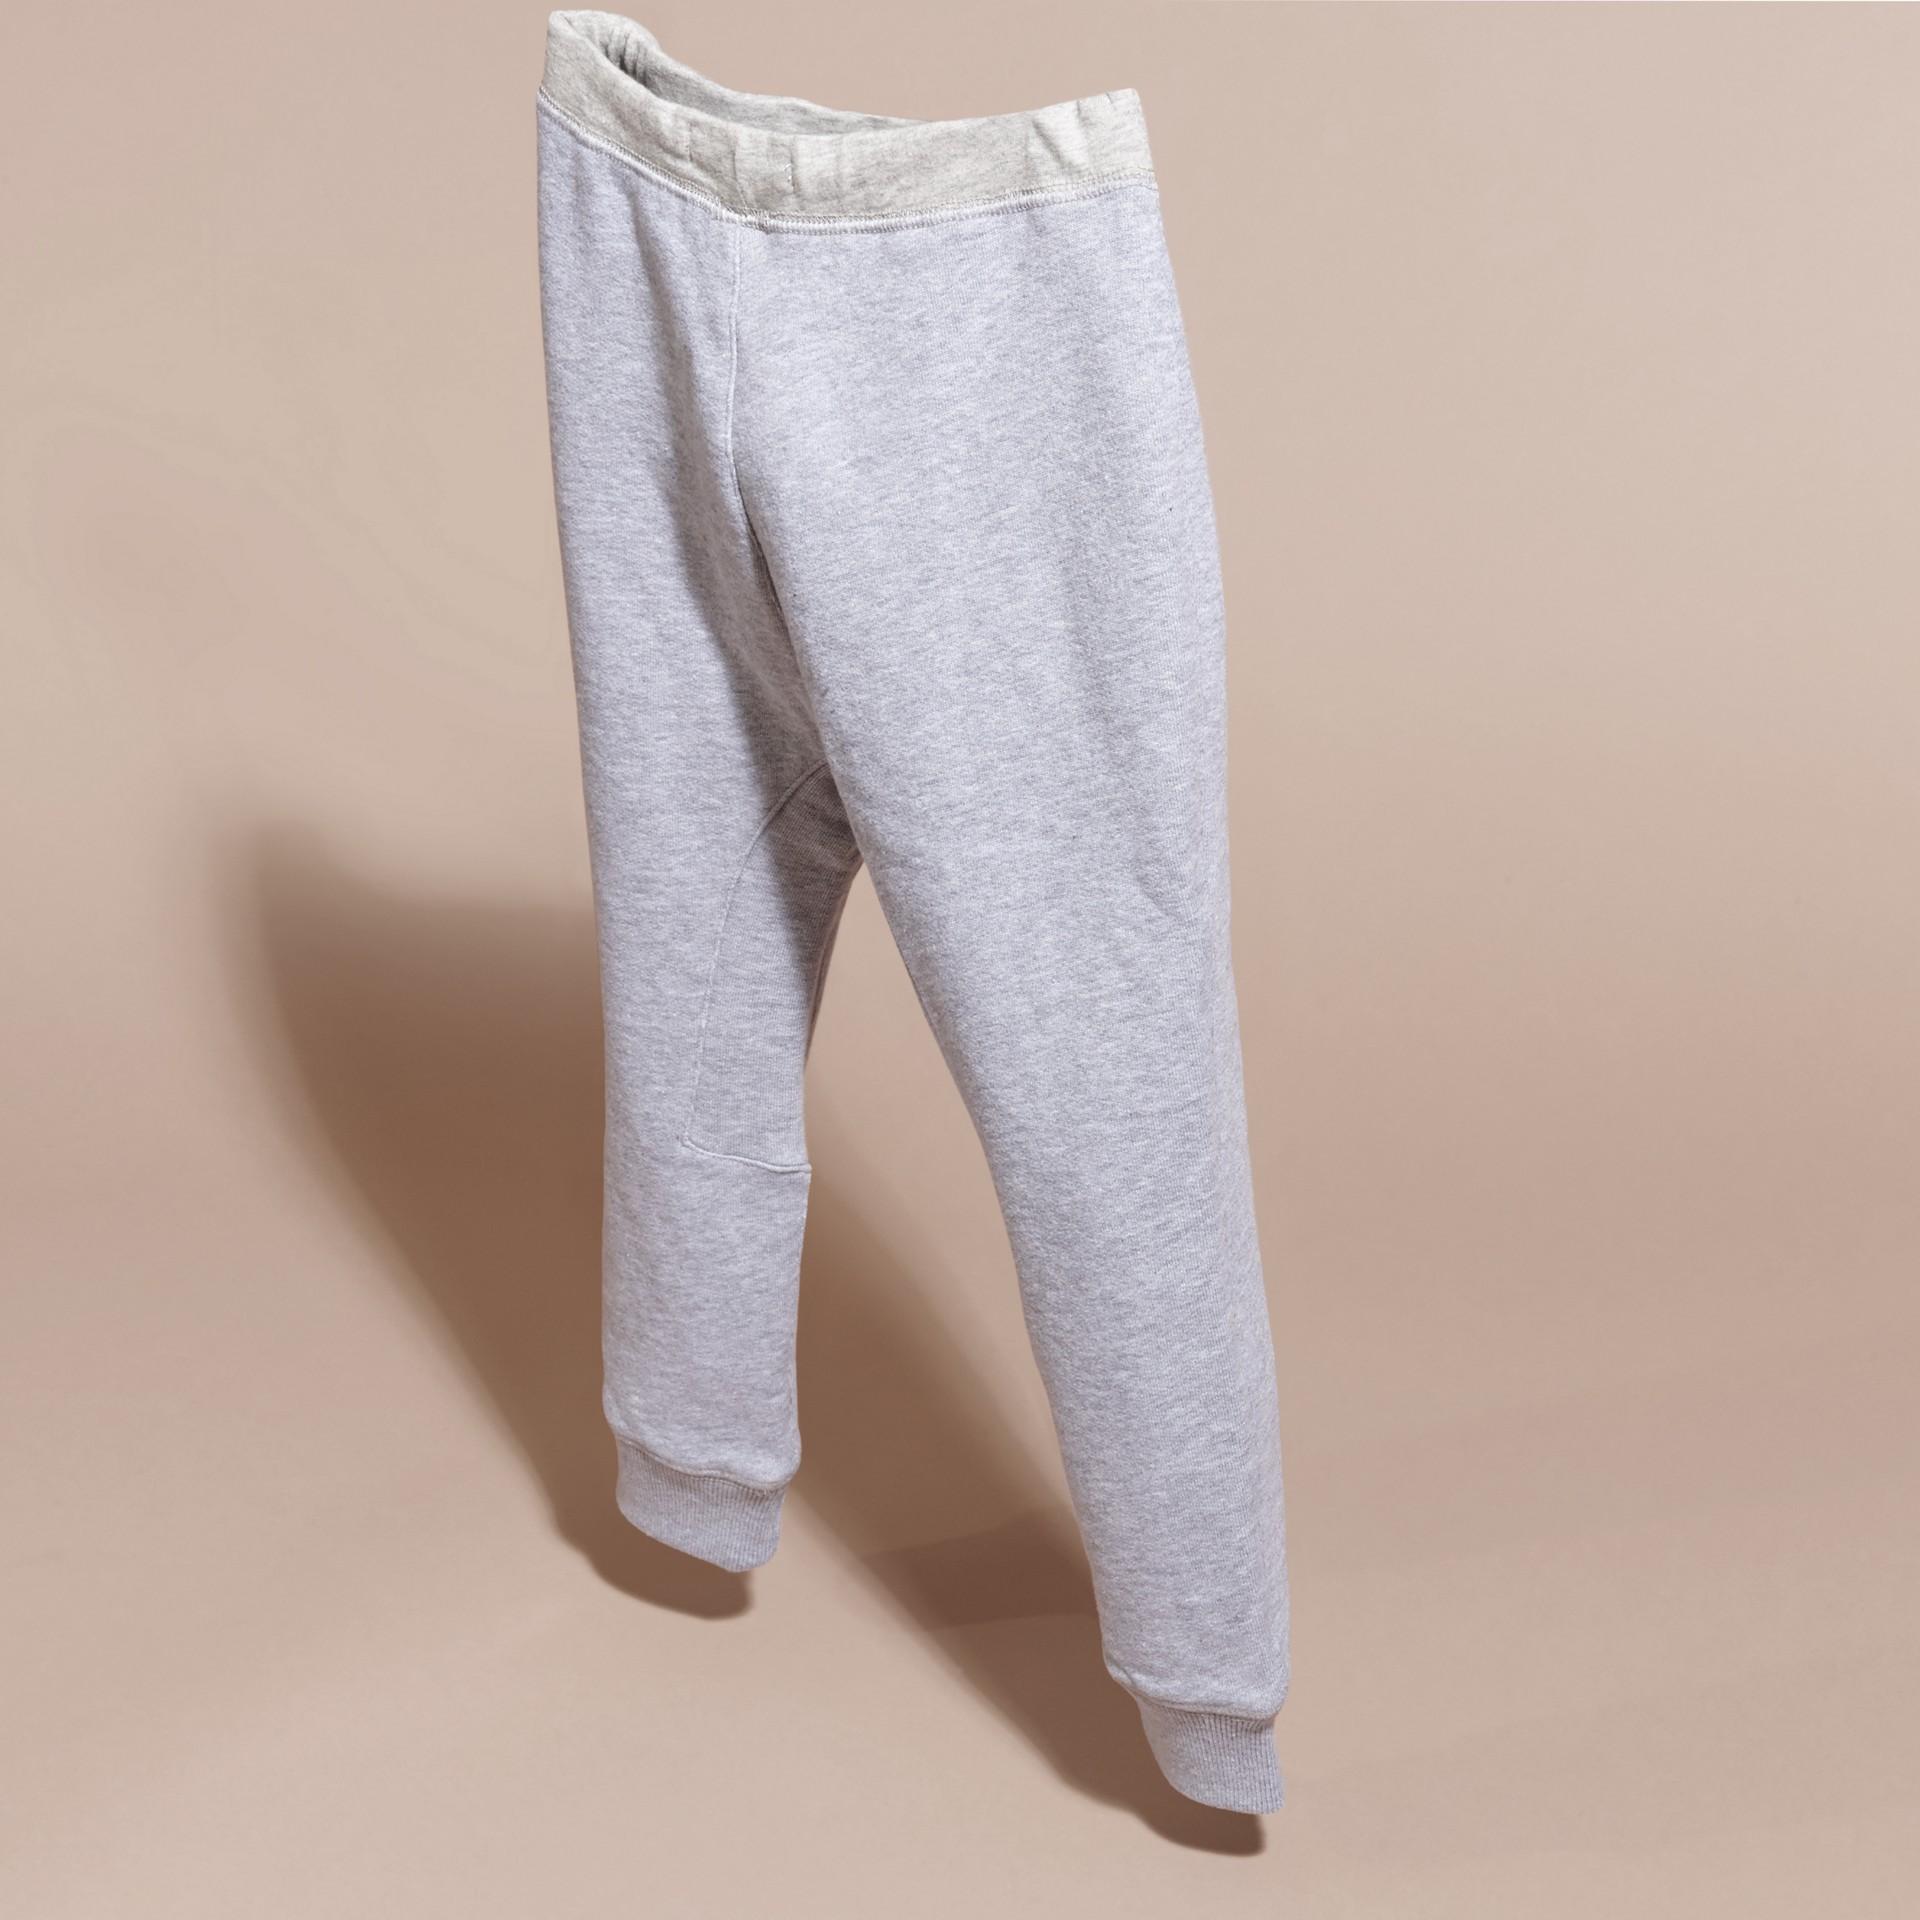 Camaïeu de gris moyens Pantalon de survêtement en coton Camaïeu  Gris Moyens - photo de la galerie 4